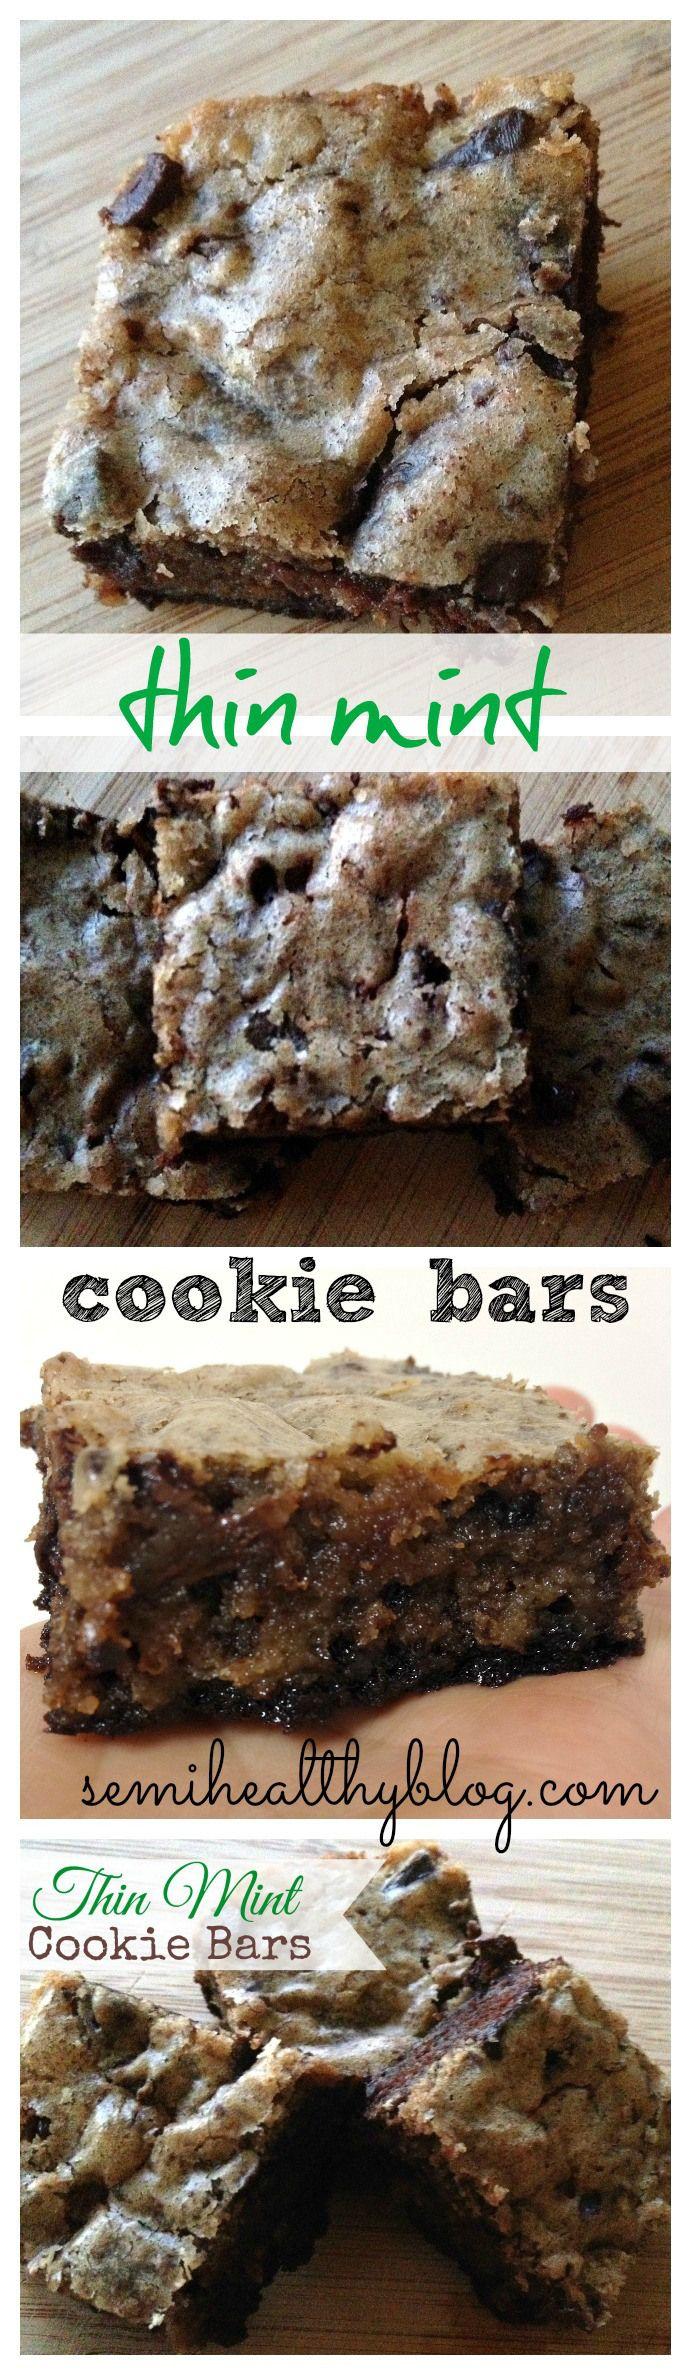 thin mint cookie bars yum via @semihealthnut at semihealthyblog